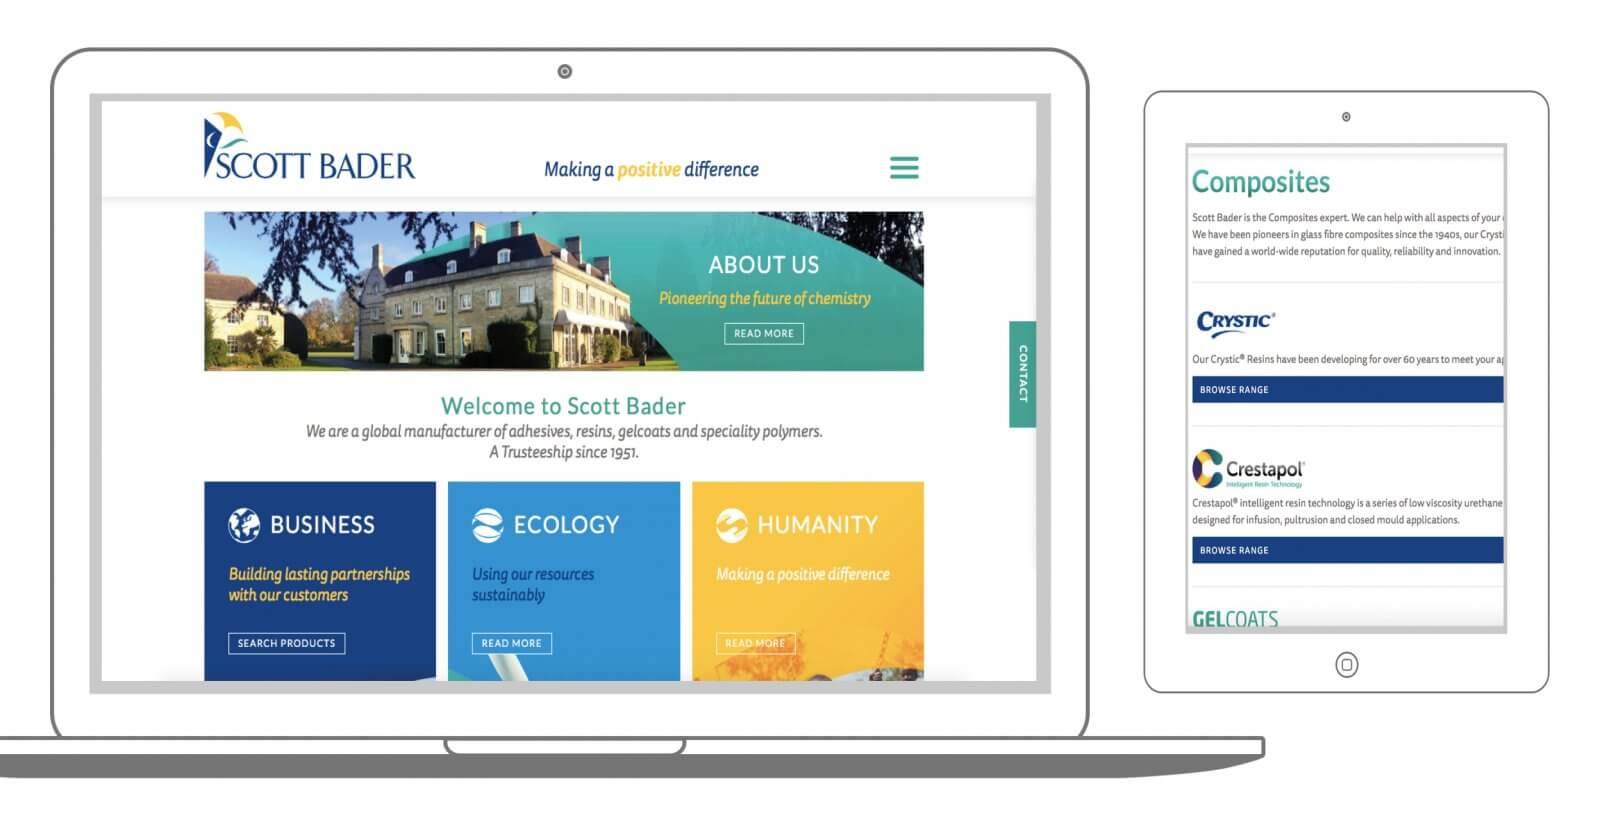 Introducing the new scottbader.com!